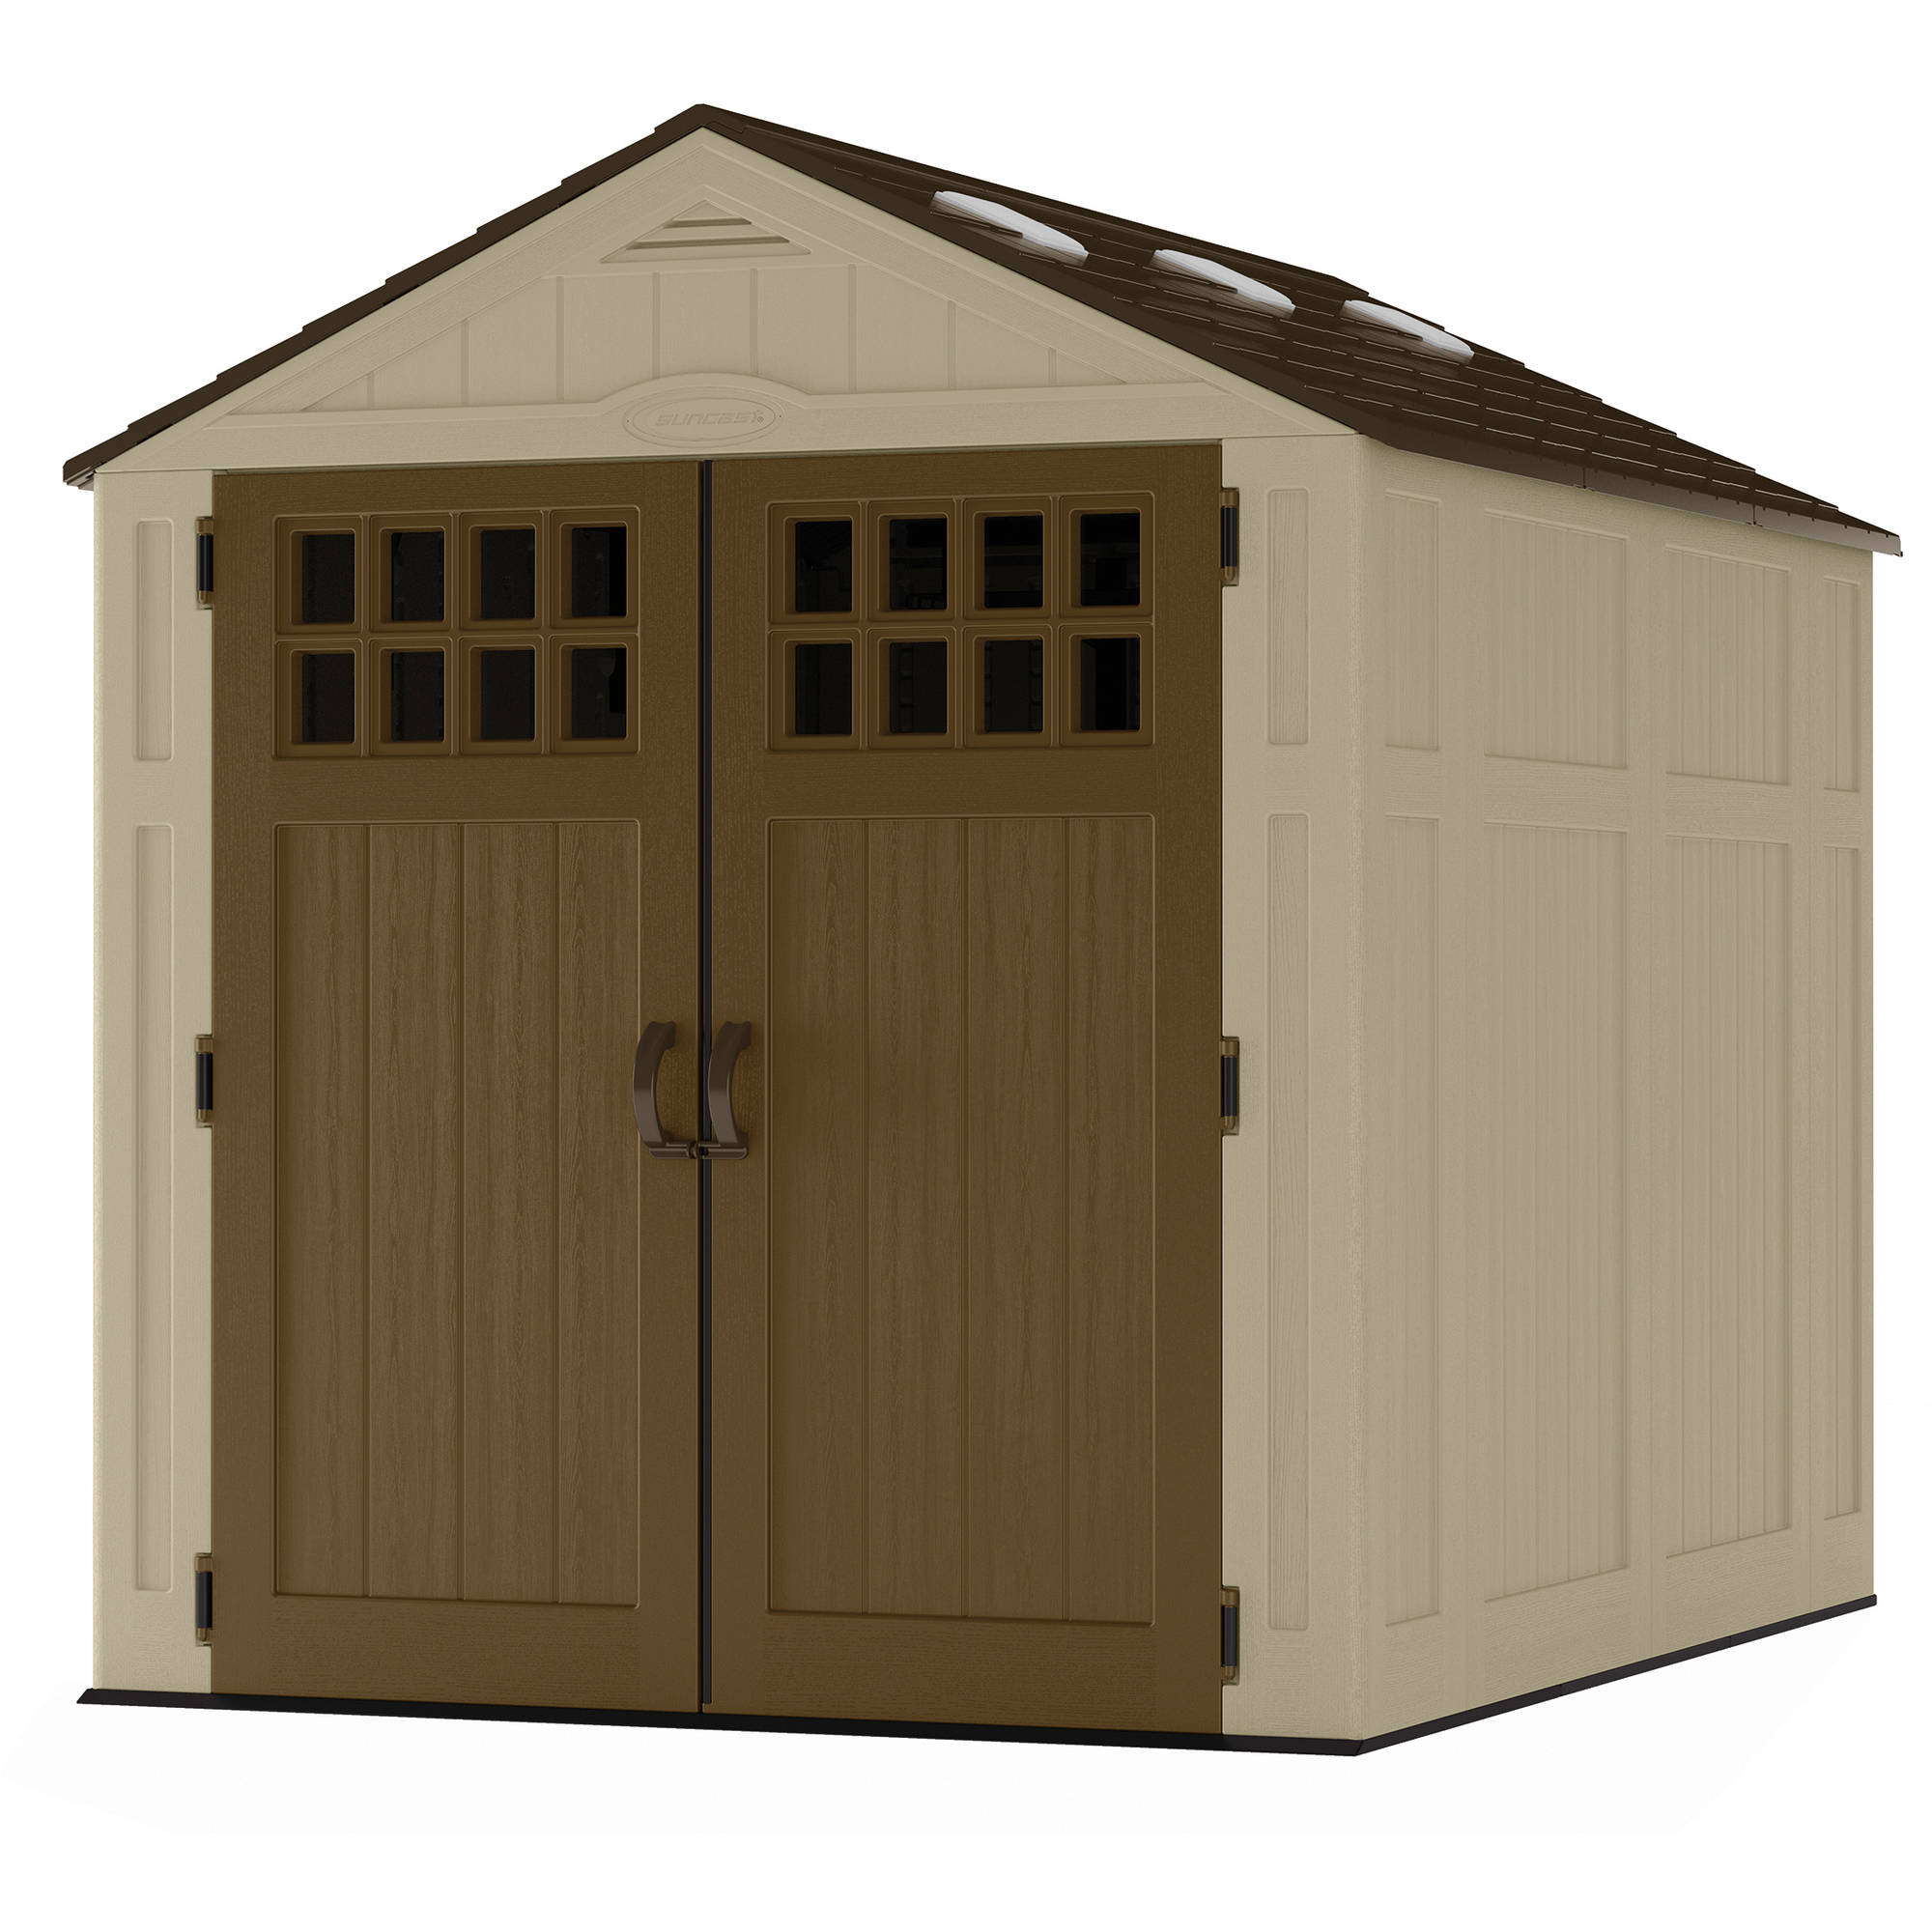 Suncast Everett™ 6x8 Storage Shed, BMS6810D